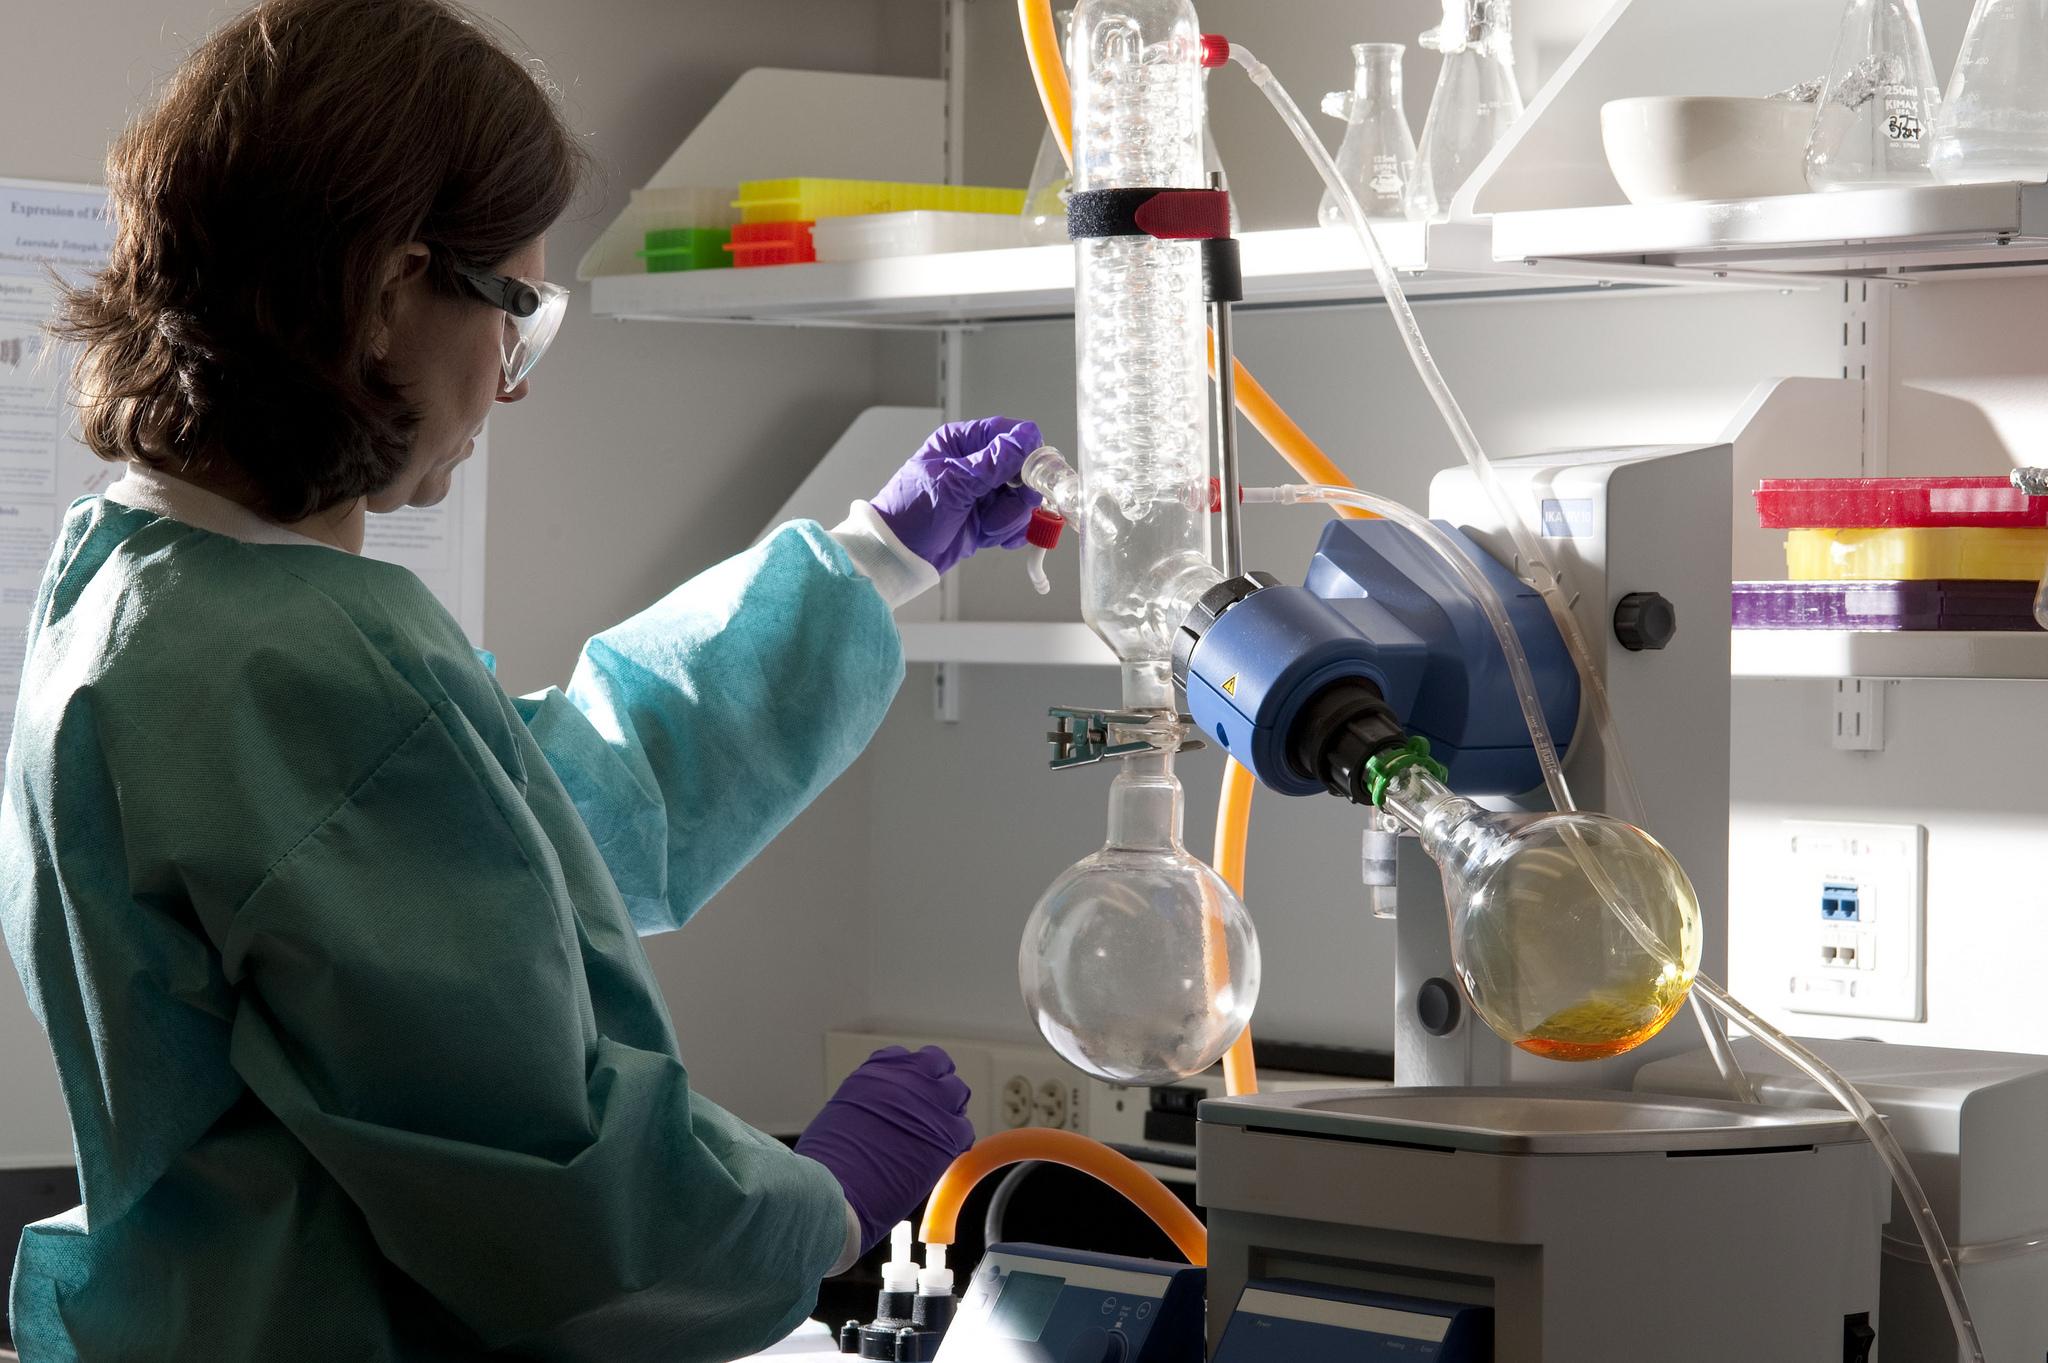 「ips細胞 創薬 イメージ画像  フリー」の画像検索結果